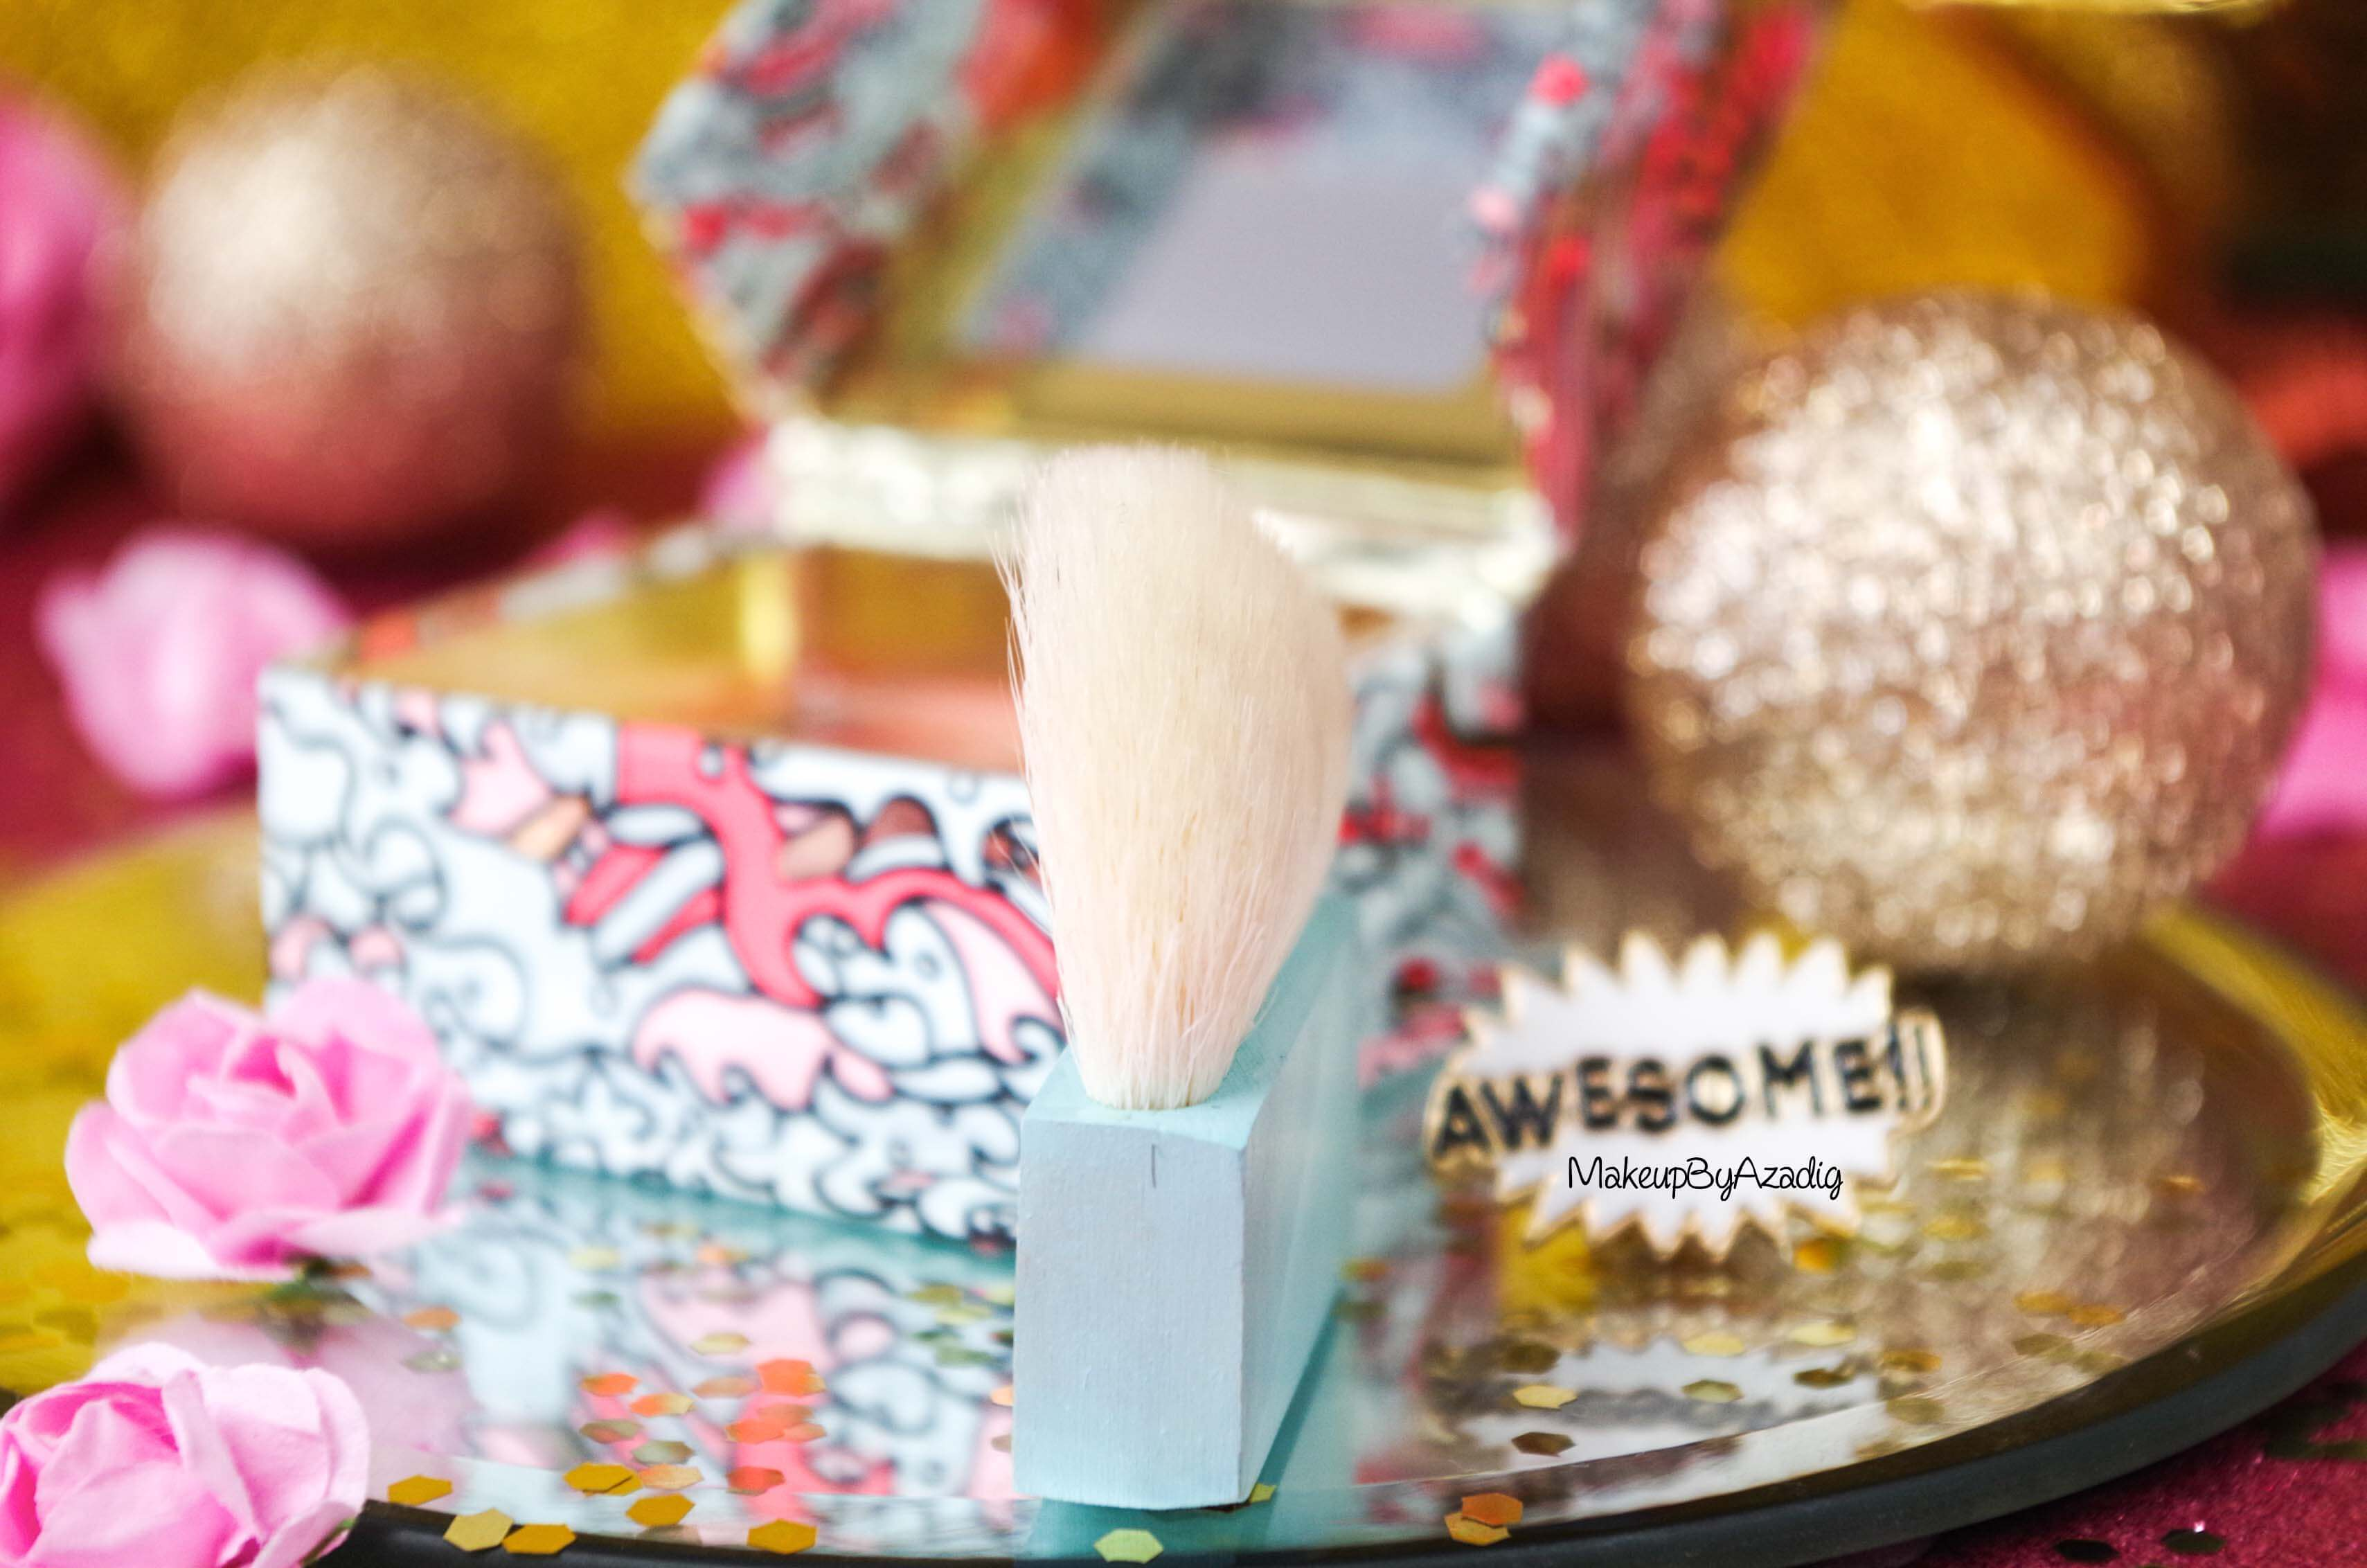 pinceau-revue-review-blush-benefit-galifornia-san-francisco-sunny-golden-pink-blush-avis-prix-sephora-makeupbyazadig-coachella